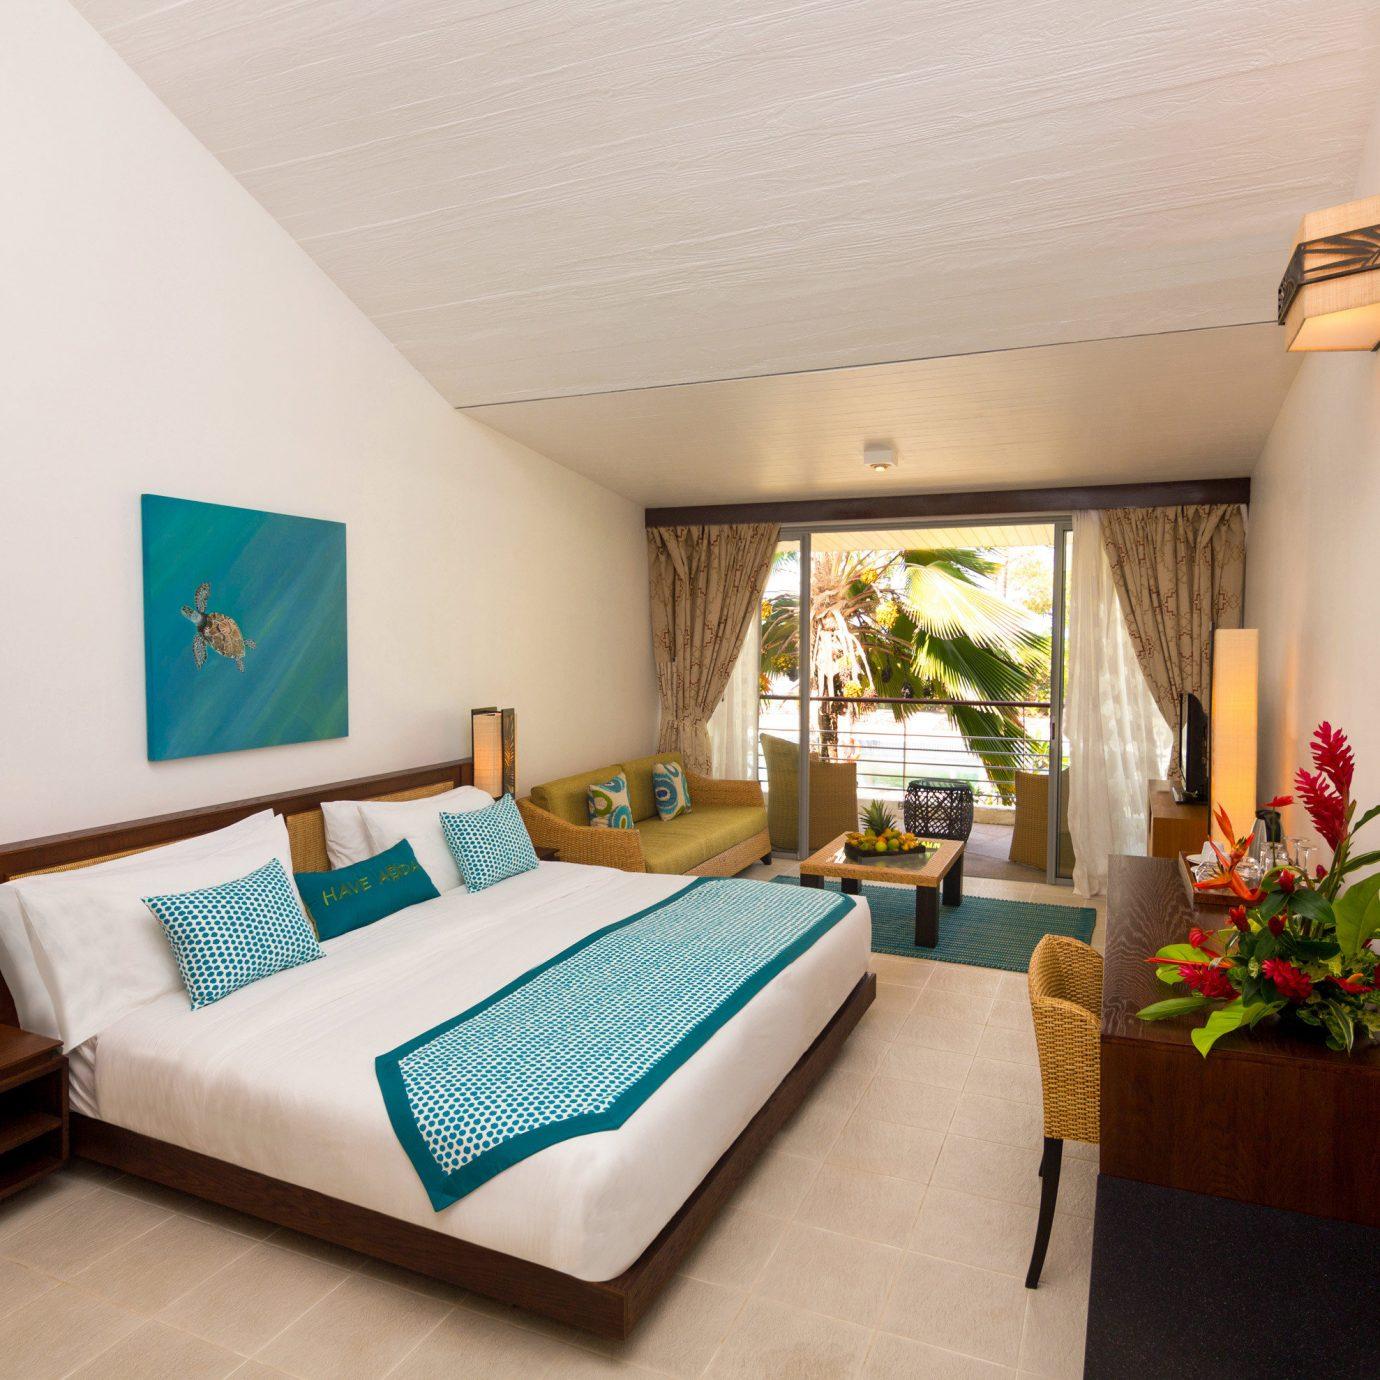 Bedroom Hip Hotels Lounge Suite property Resort Villa cottage living room condominium